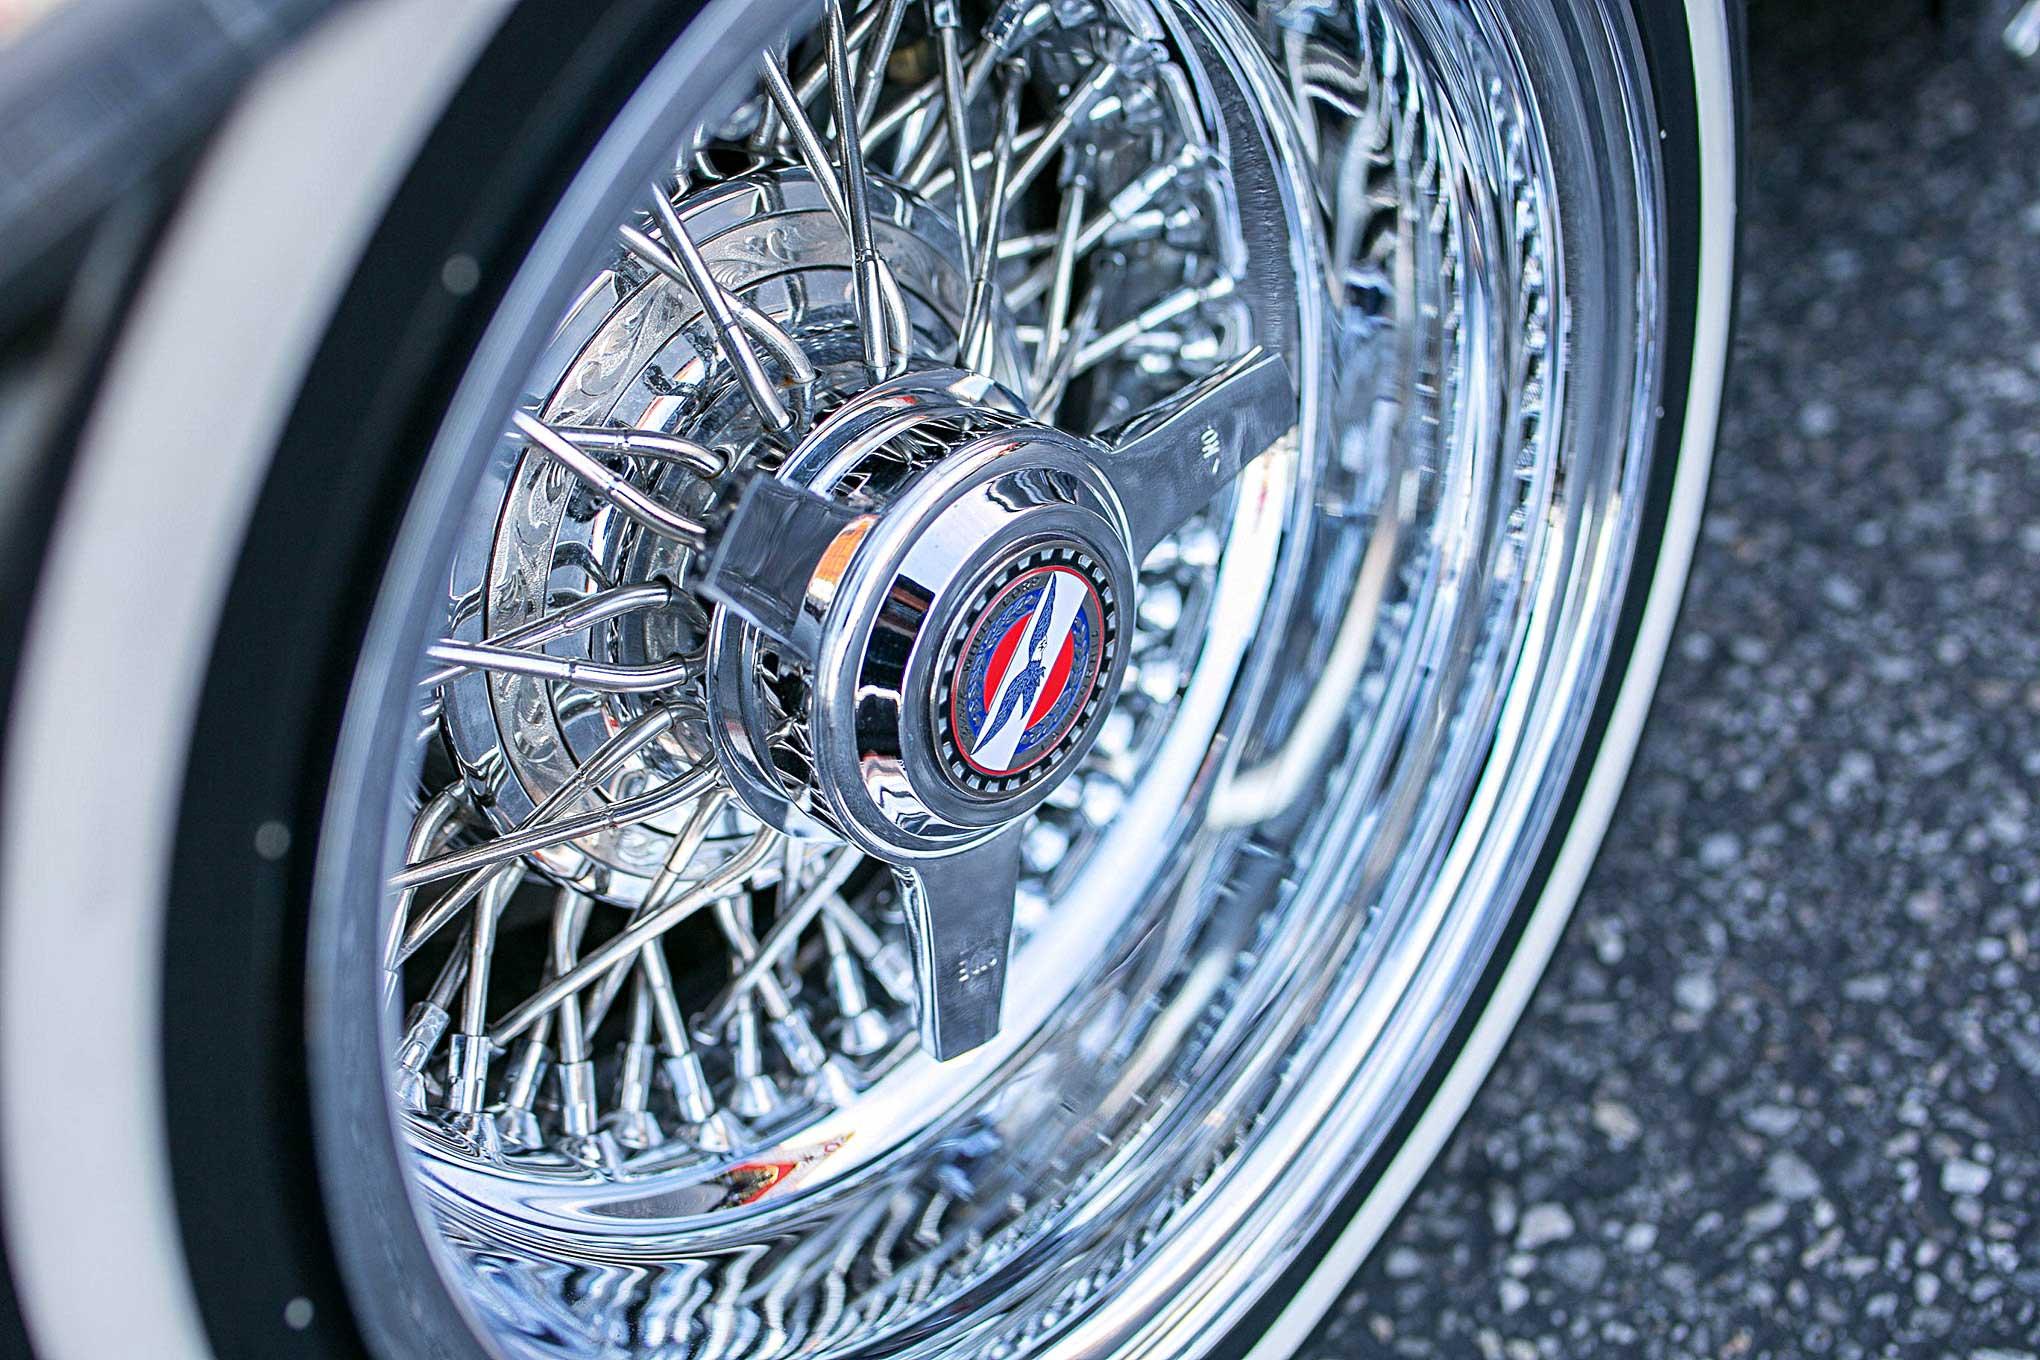 1953 Chevrolet Bel Air Zenith wire wheel three ear knock off - Lowrider